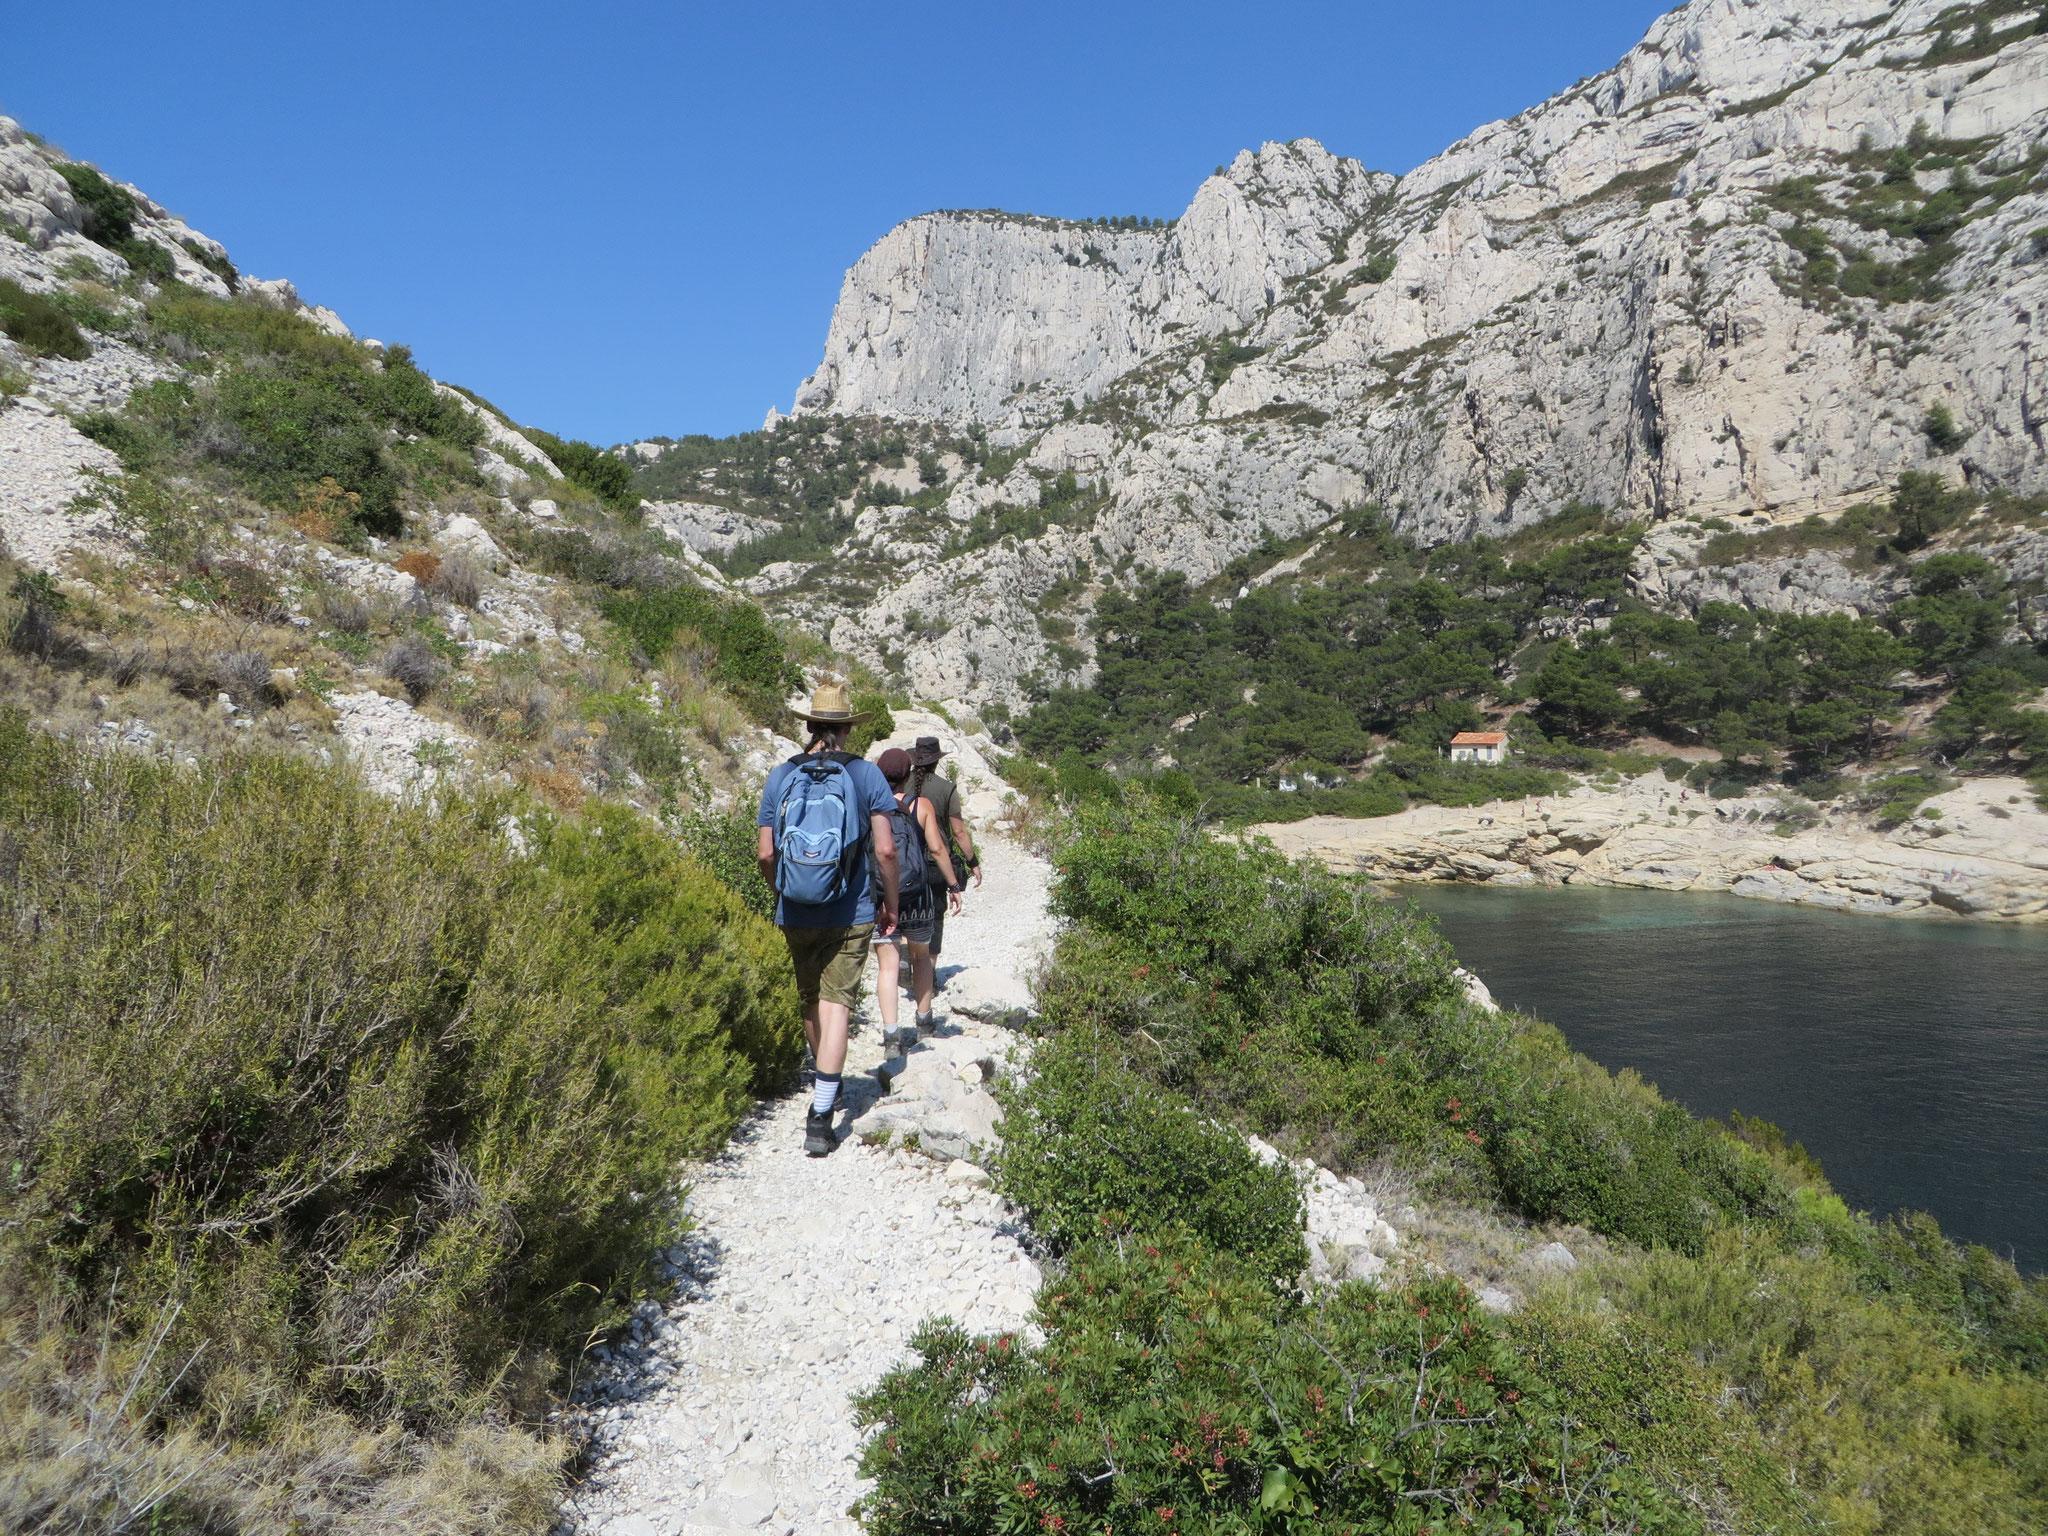 Hitzeschlacht nach der Rückkehr vom Cap Morgiou / Calanque de la Triperie